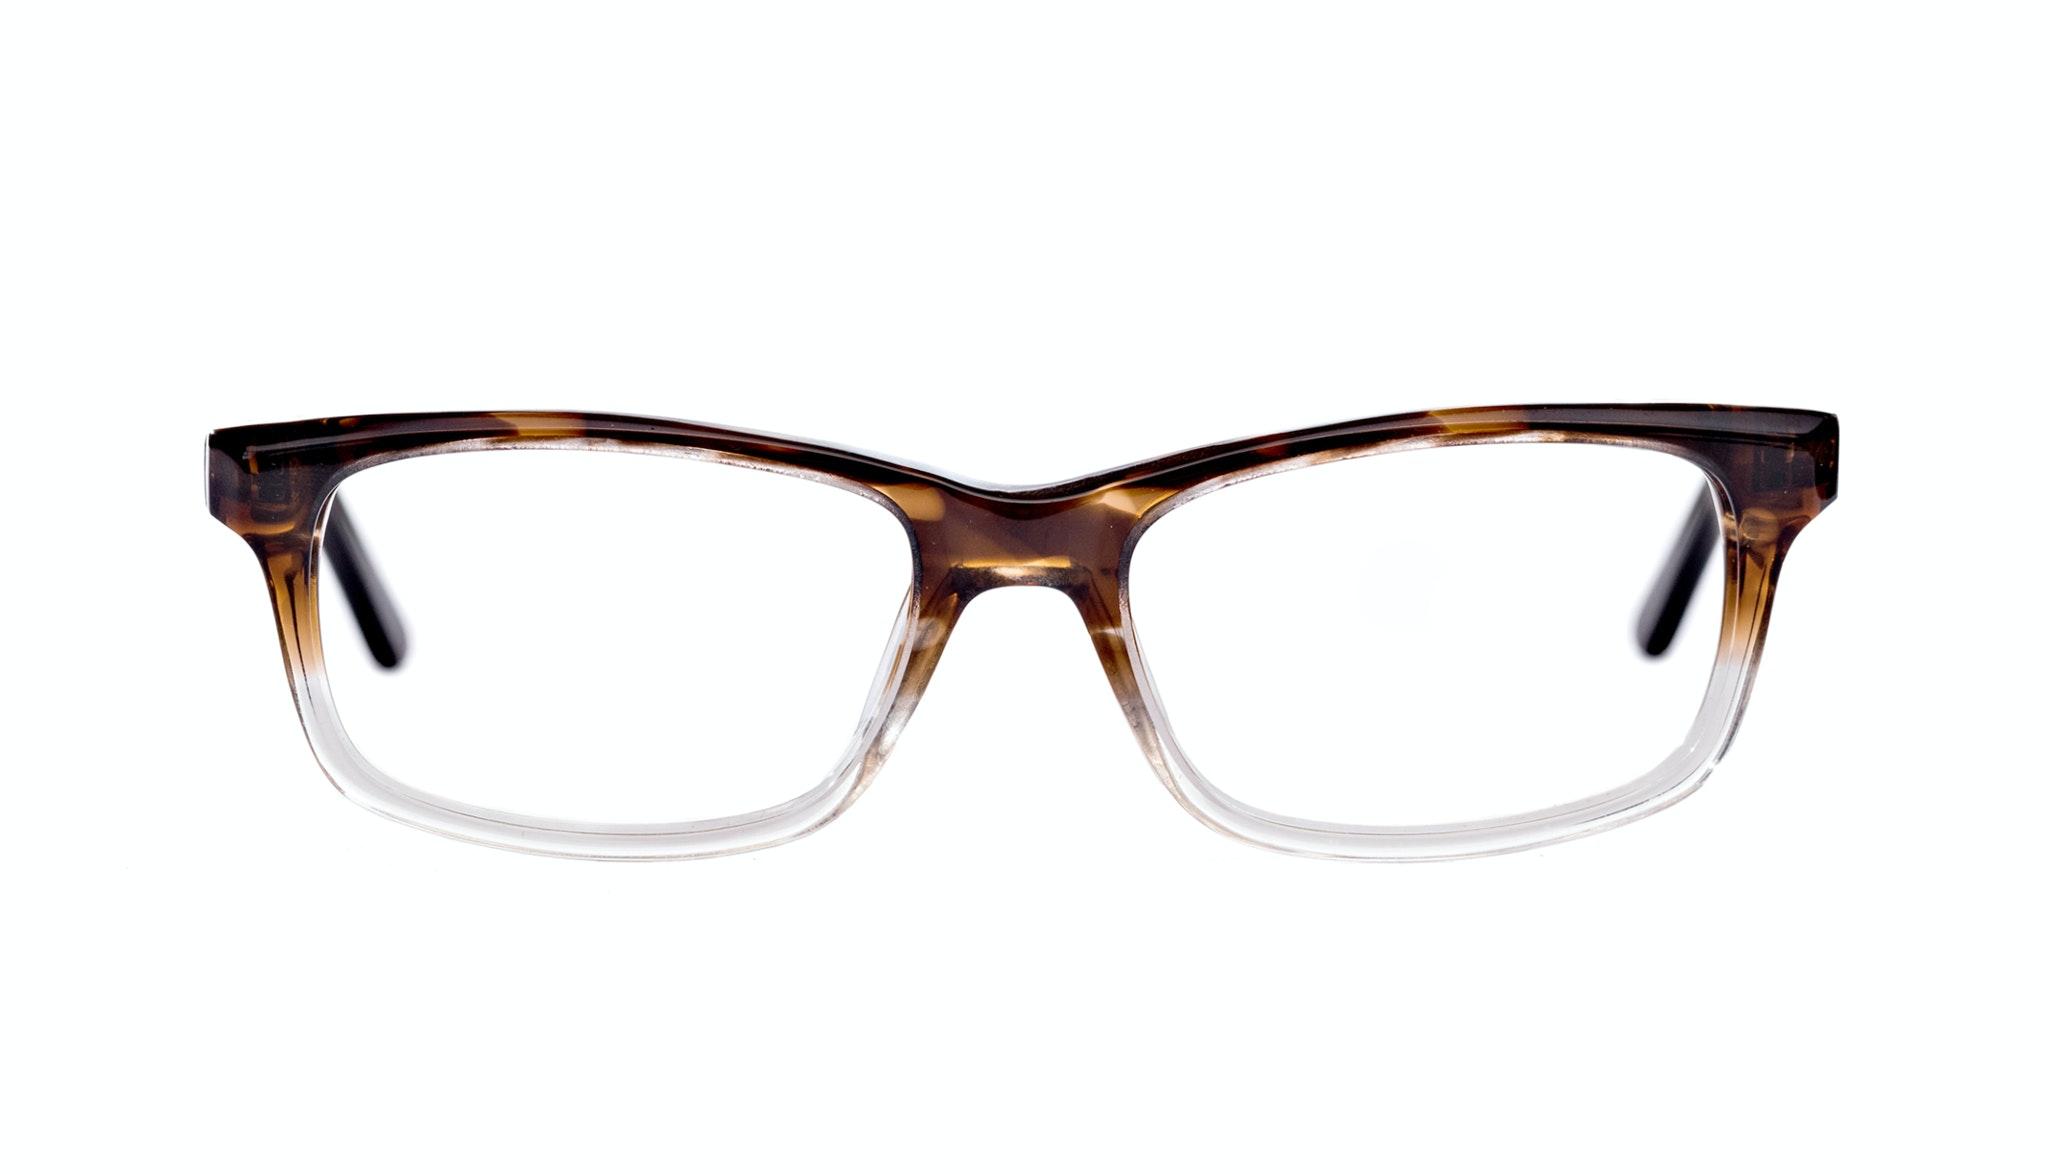 Affordable Fashion Glasses Rectangle Eyeglasses Men Women Atwater Bark Front